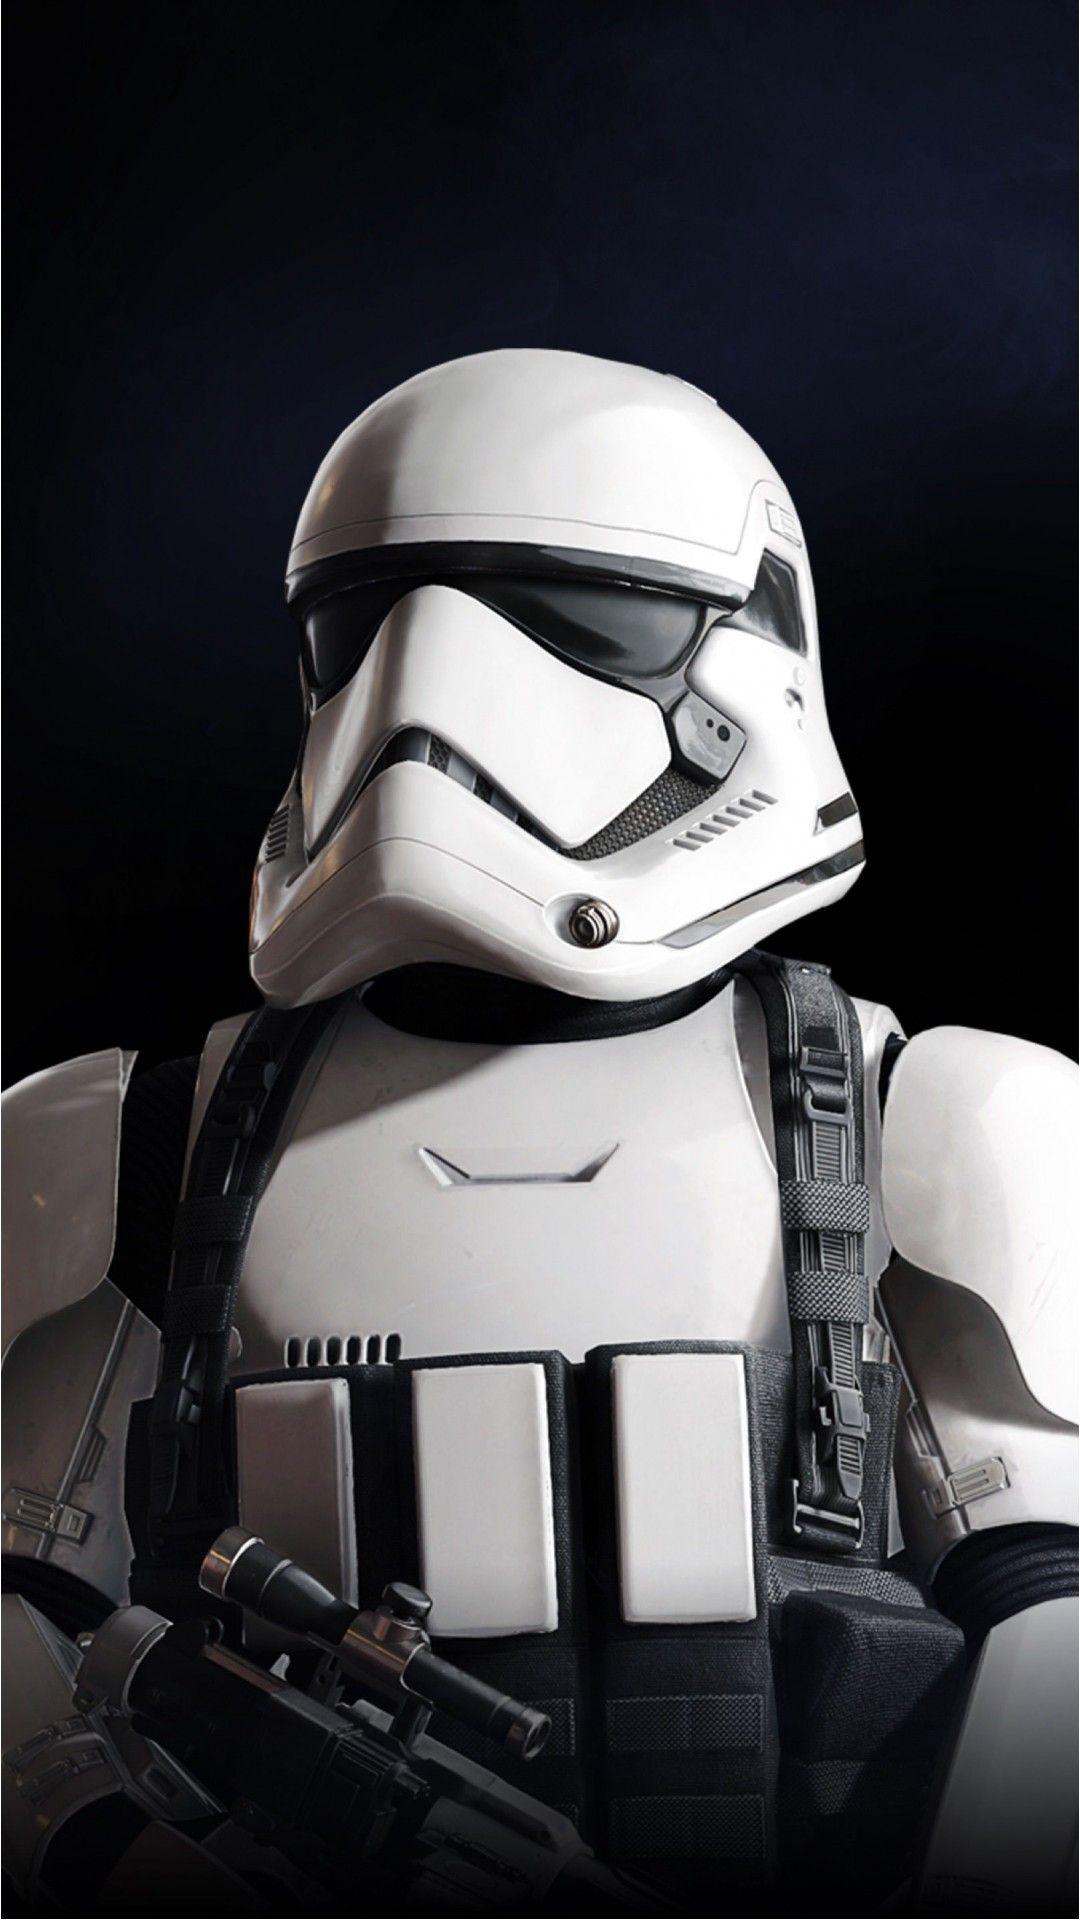 Wallpapers, Star Wars Battlefront Ii, Free, Downloads, Mobile